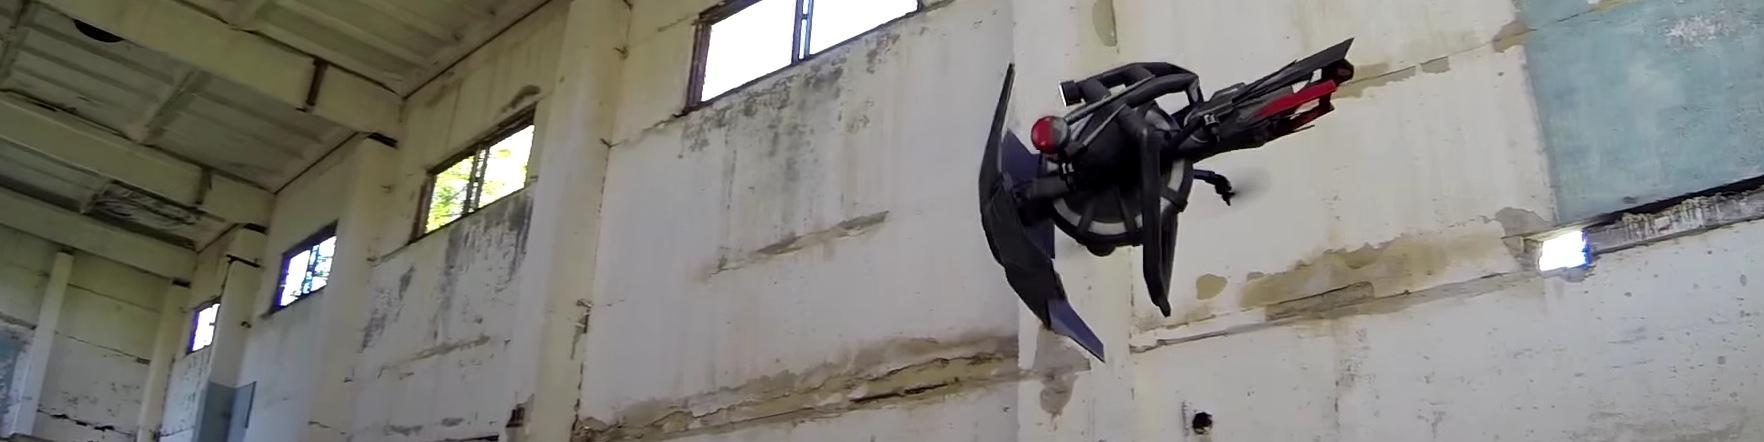 scanner drone side